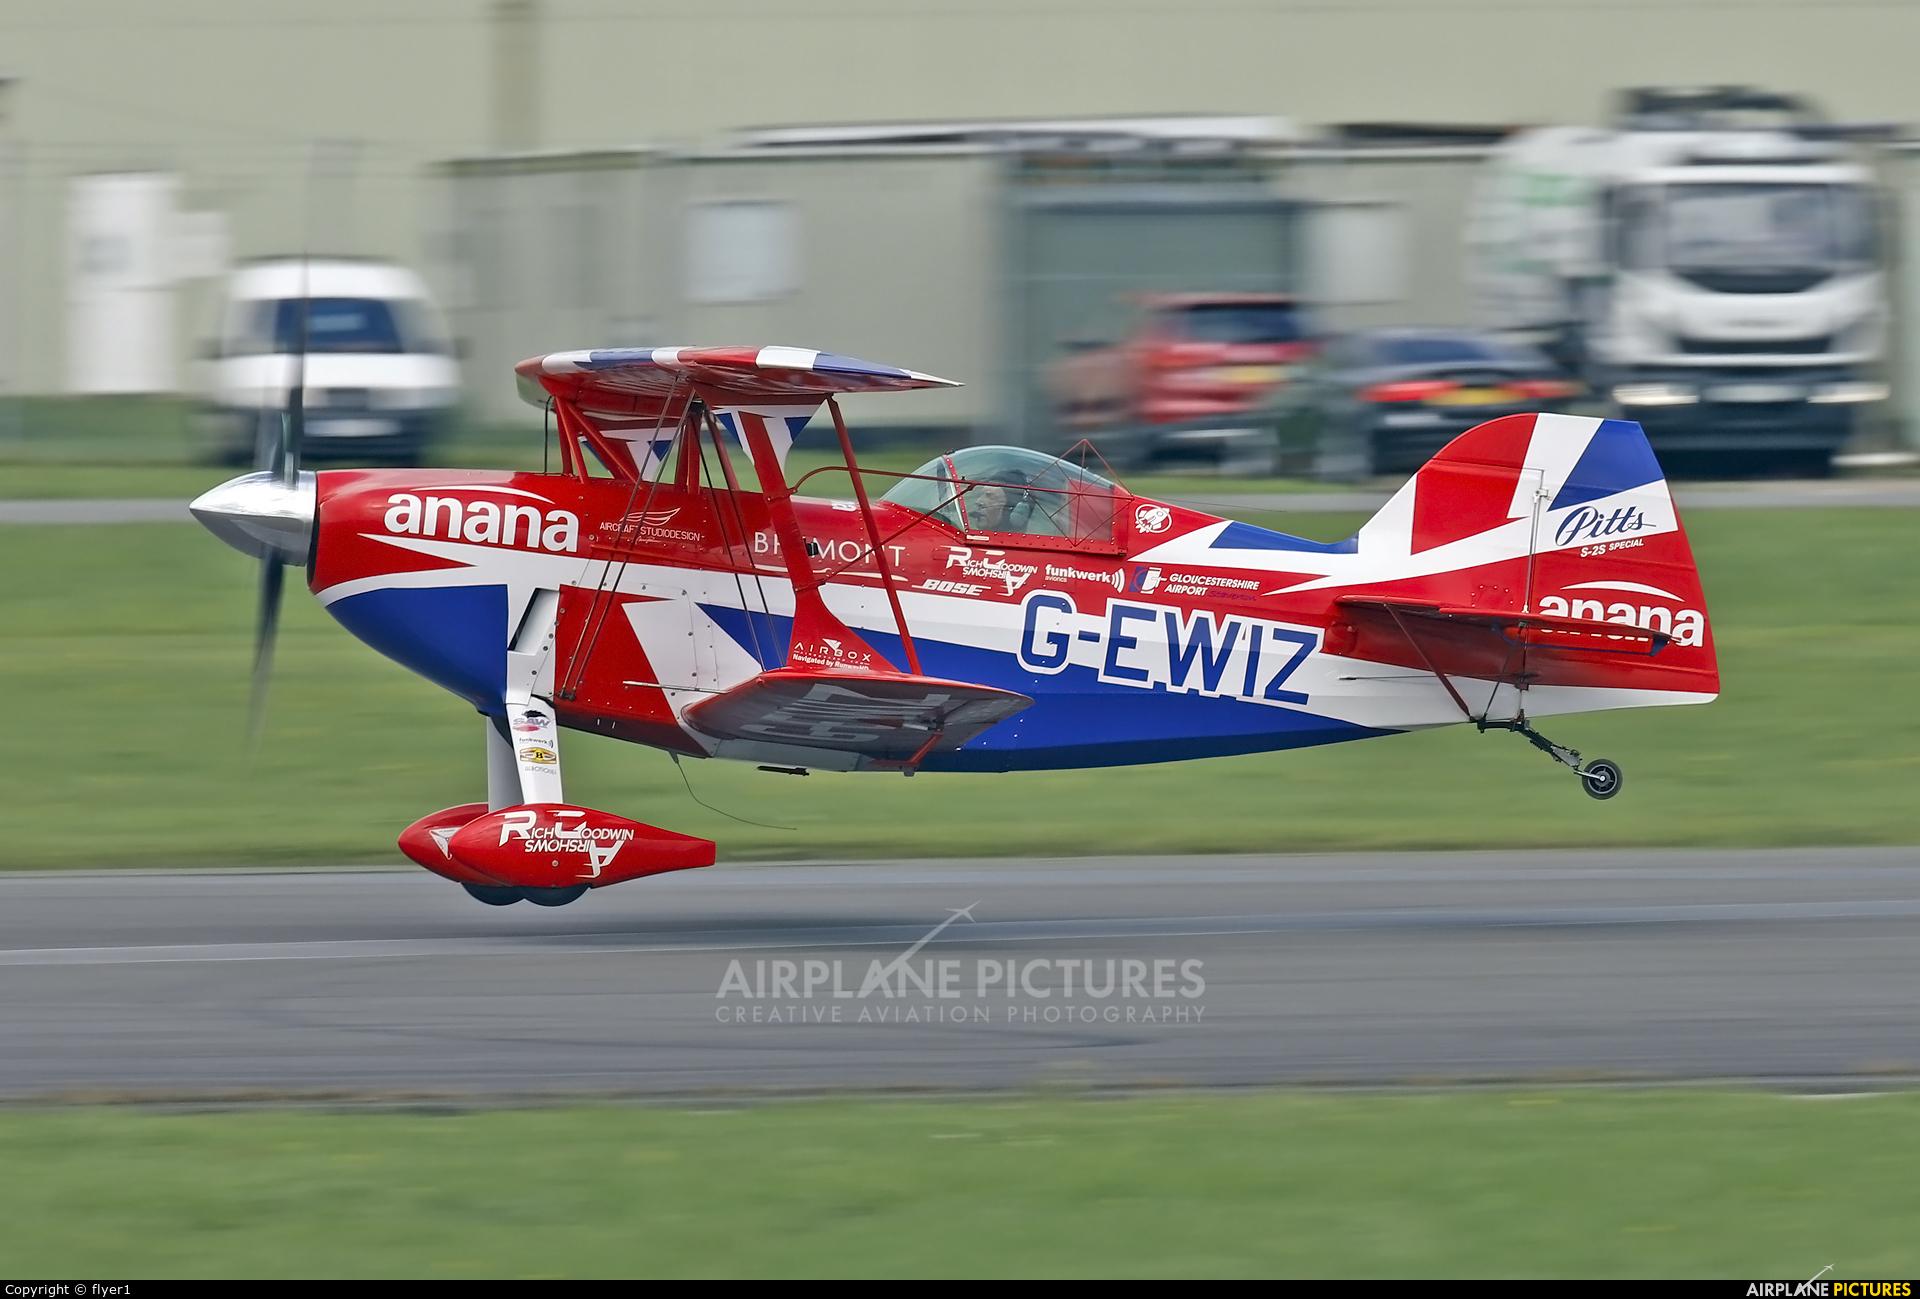 Rich Goodwin Airshows G-EWIZ aircraft at Dunsfold